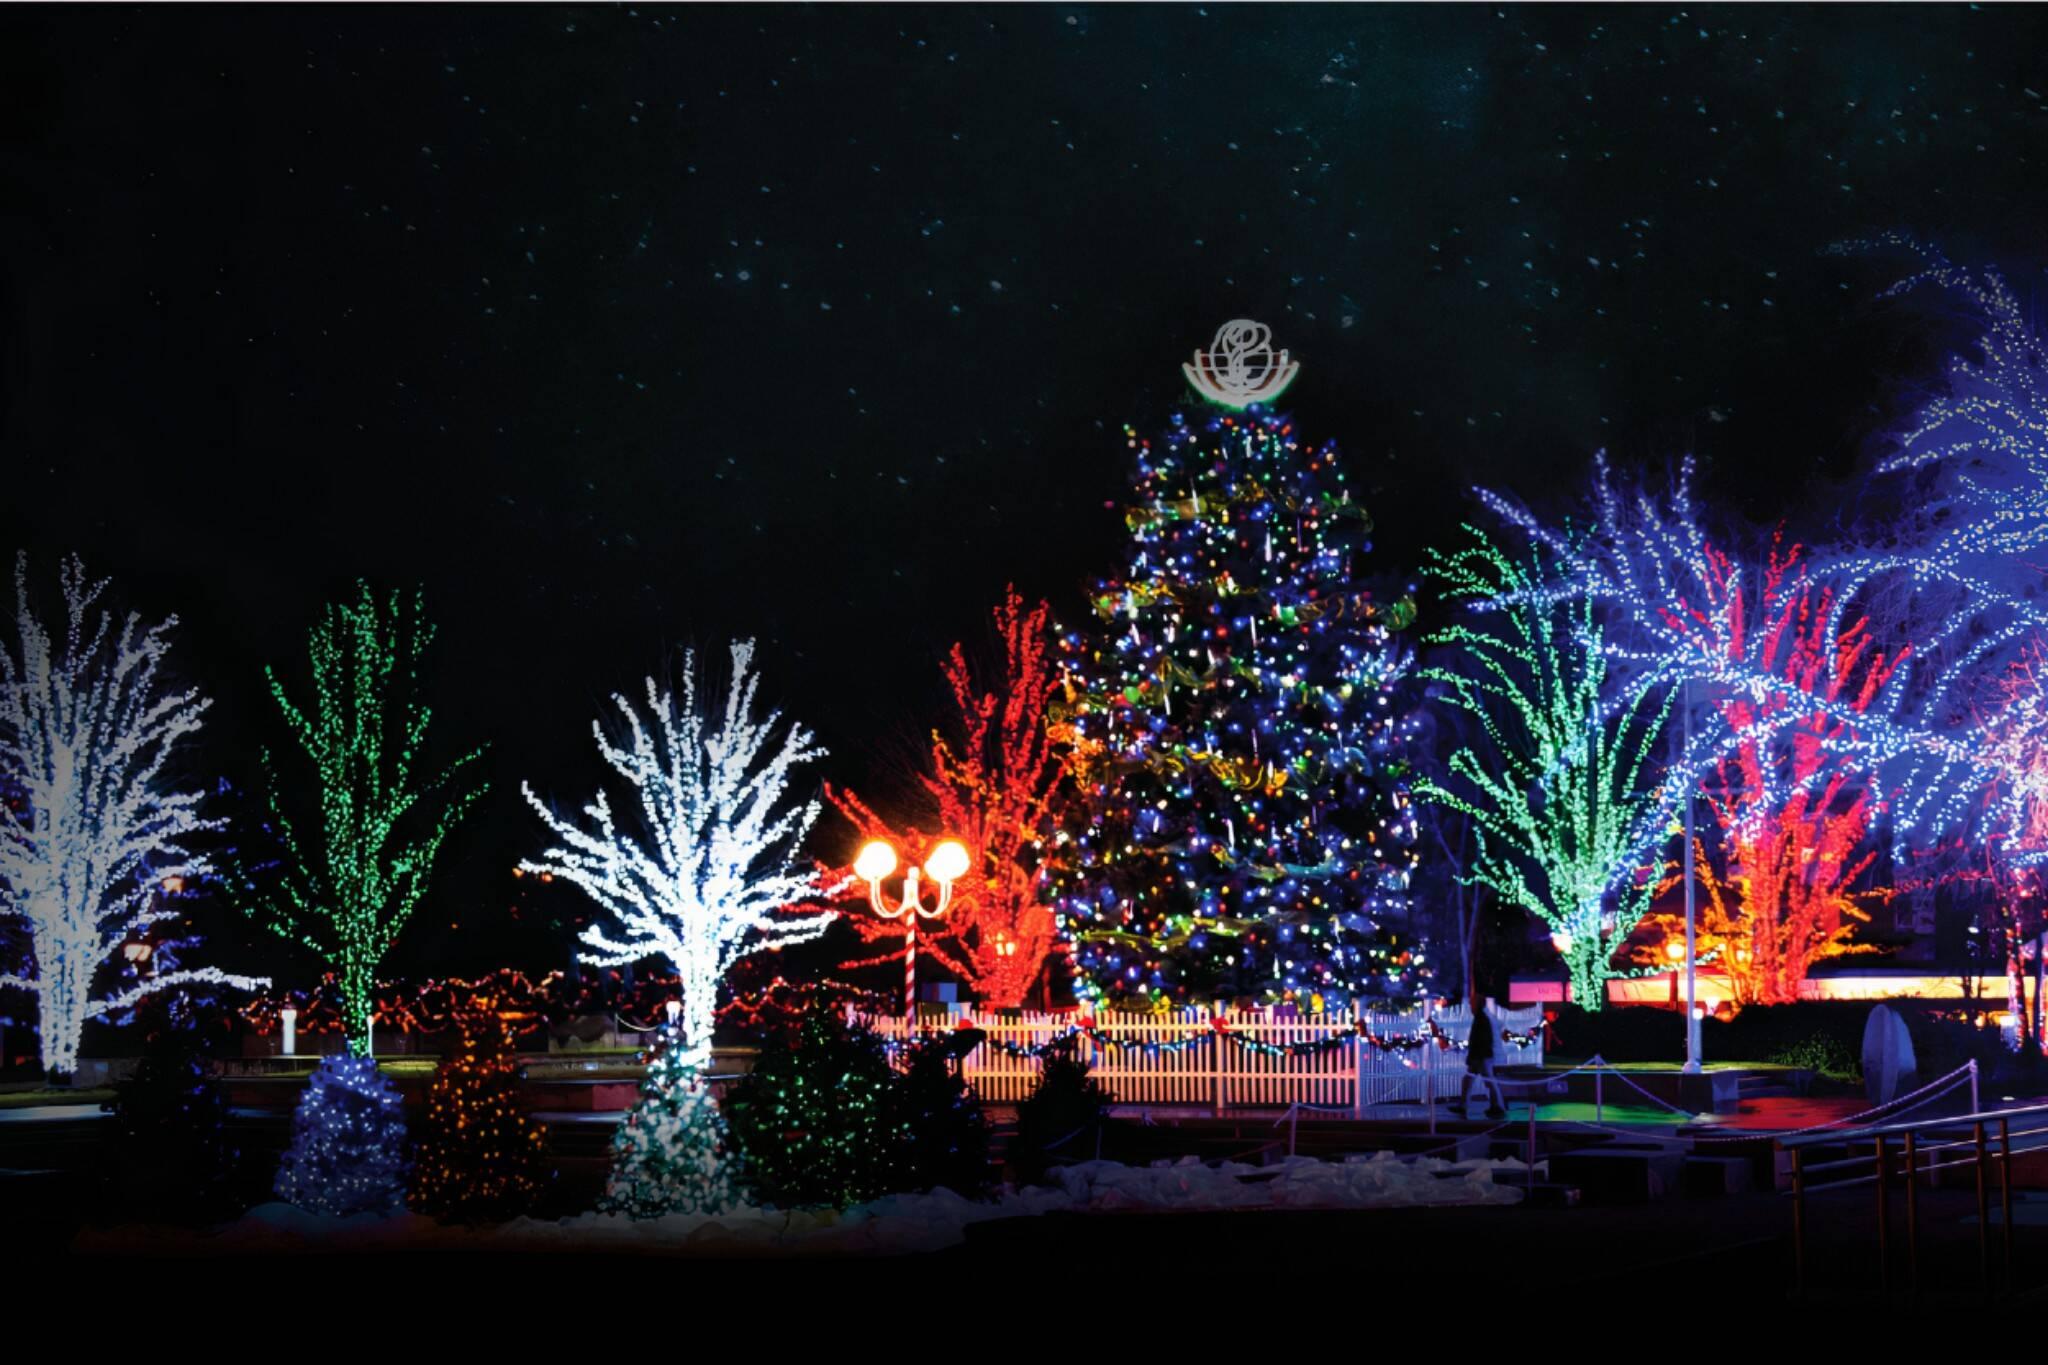 brampton winter lights festival